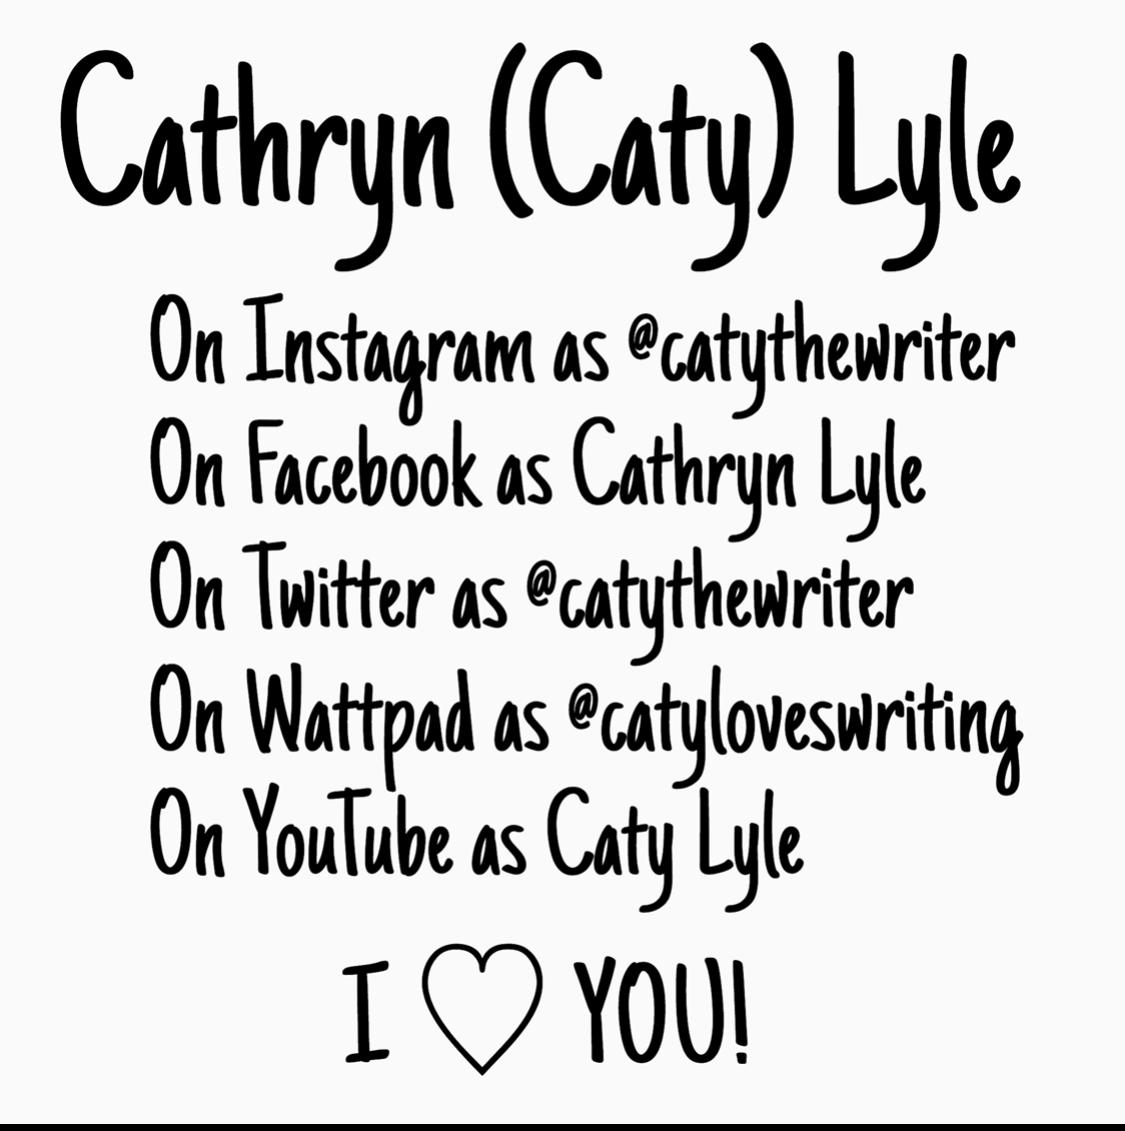 Cathryn  (Caty) Lyle's Blog